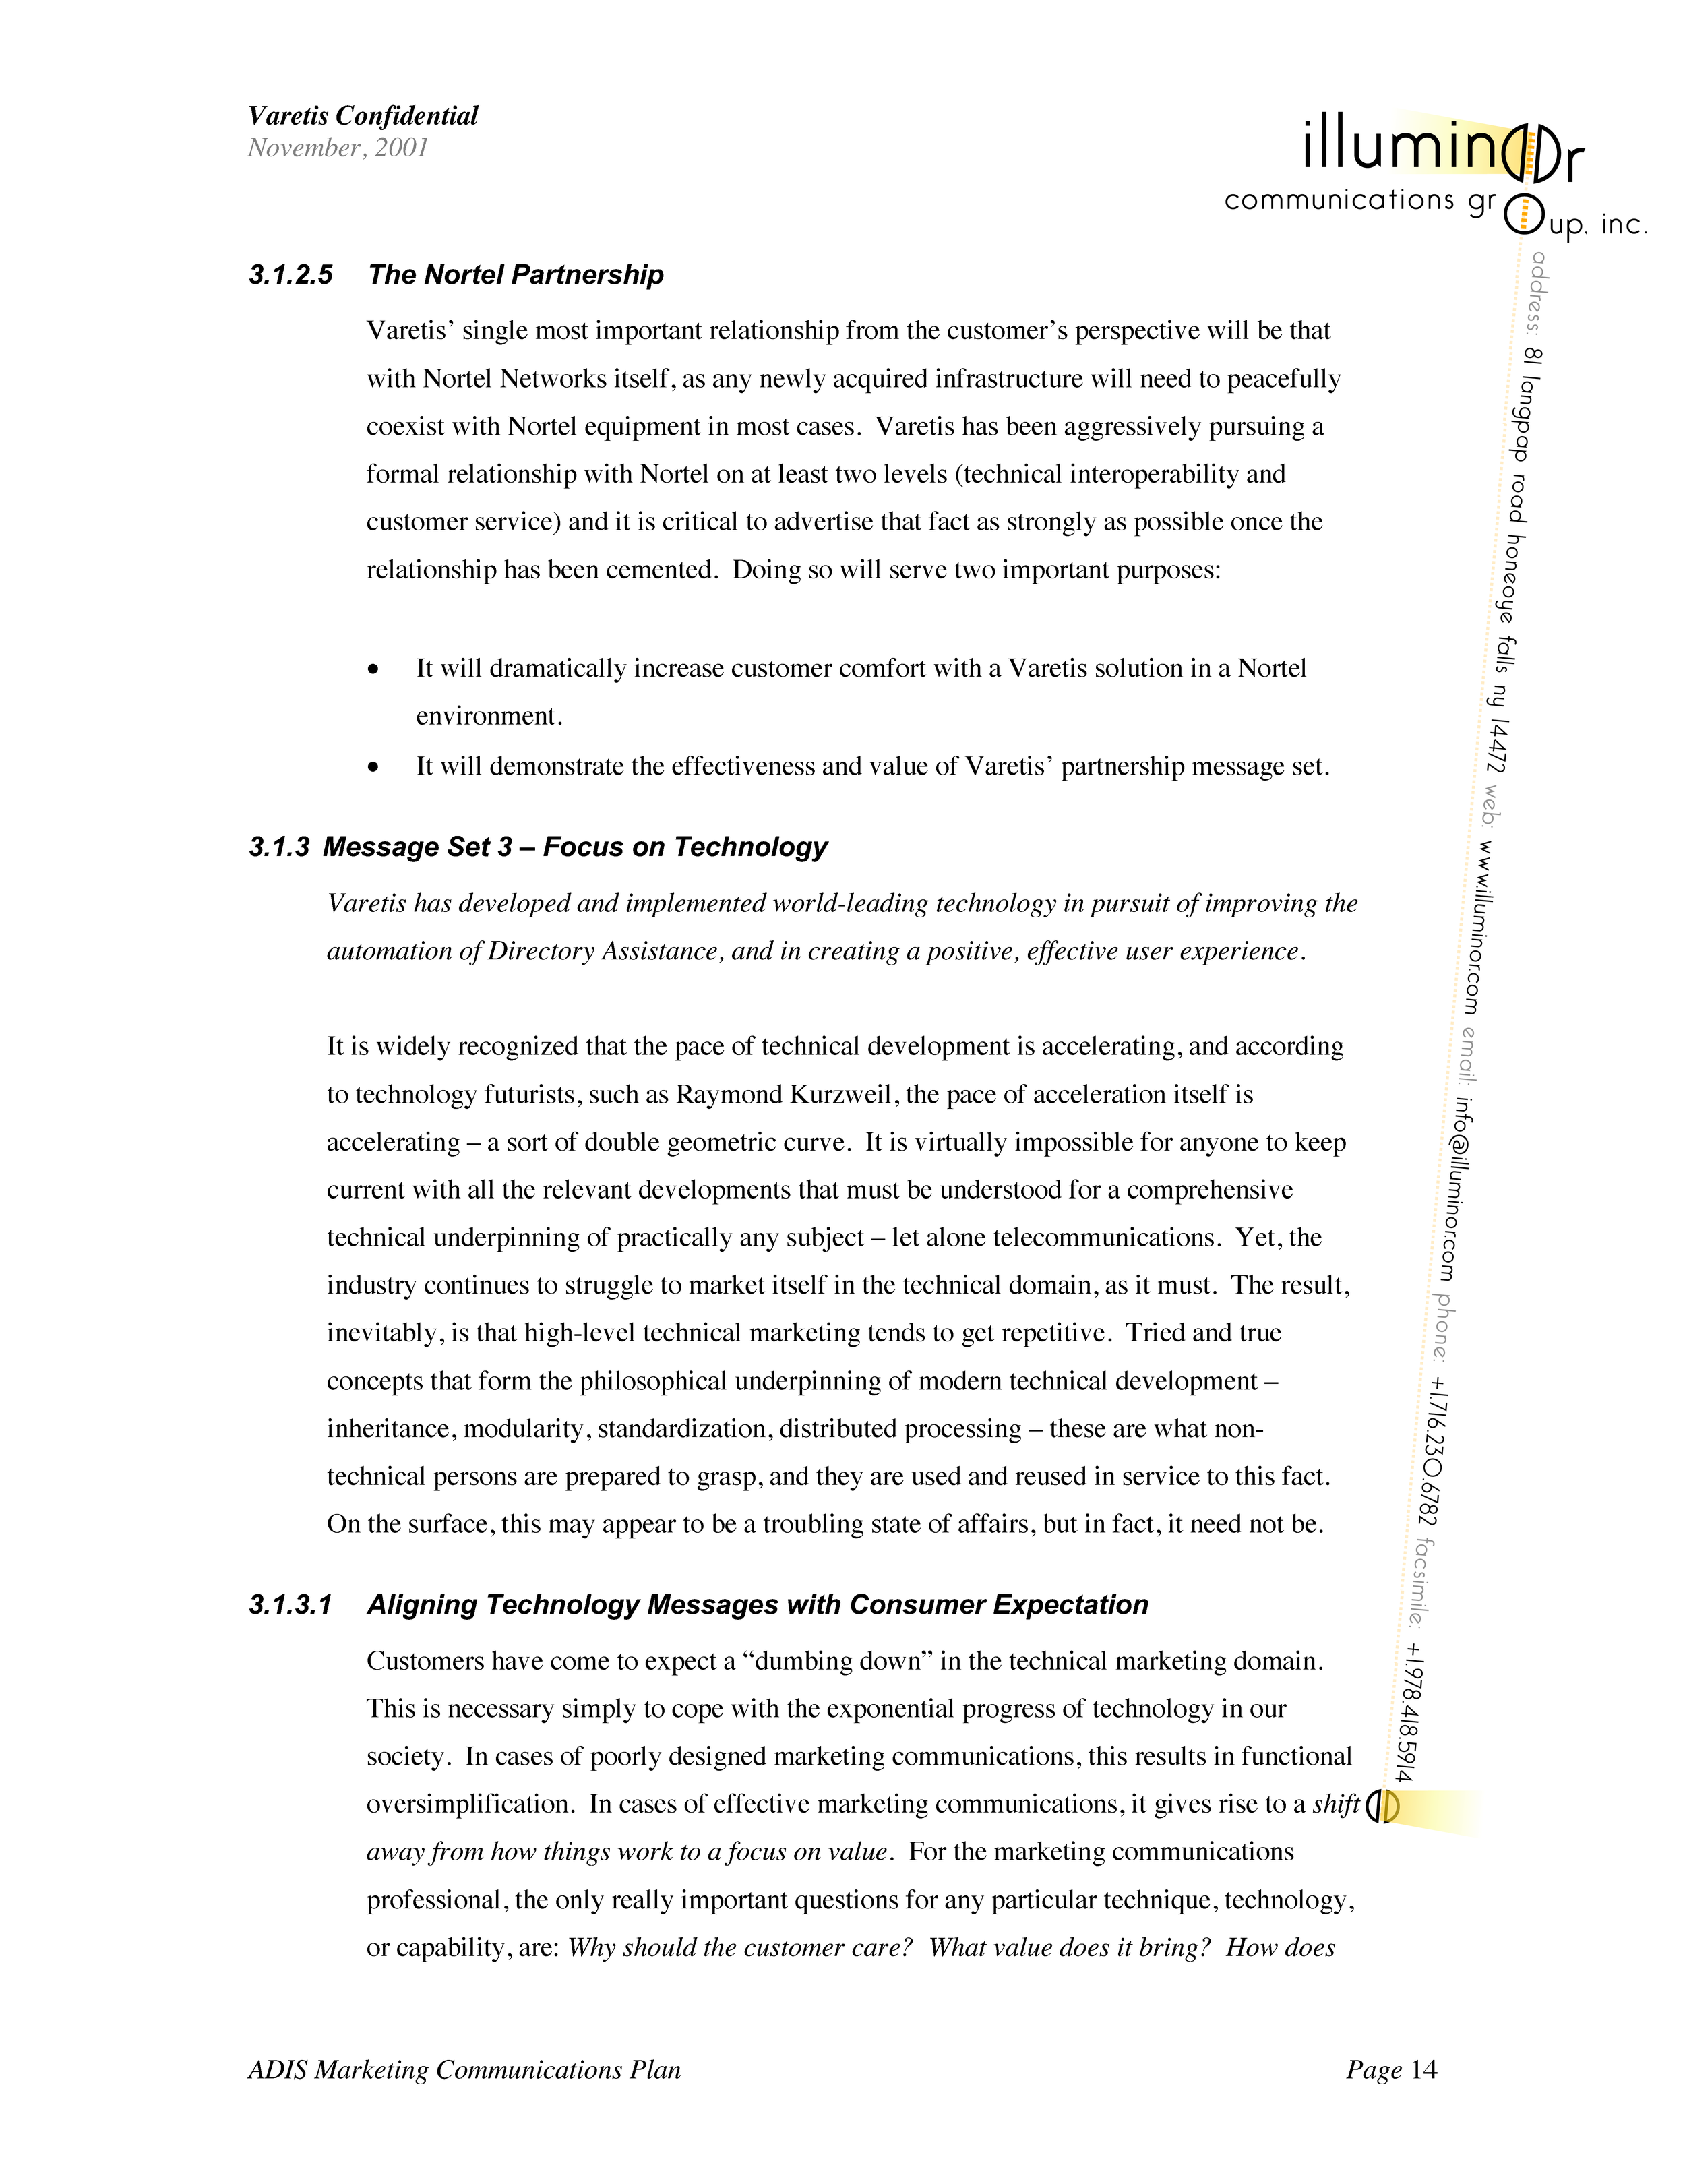 ADIS Marcomm Plan_Page_14.png